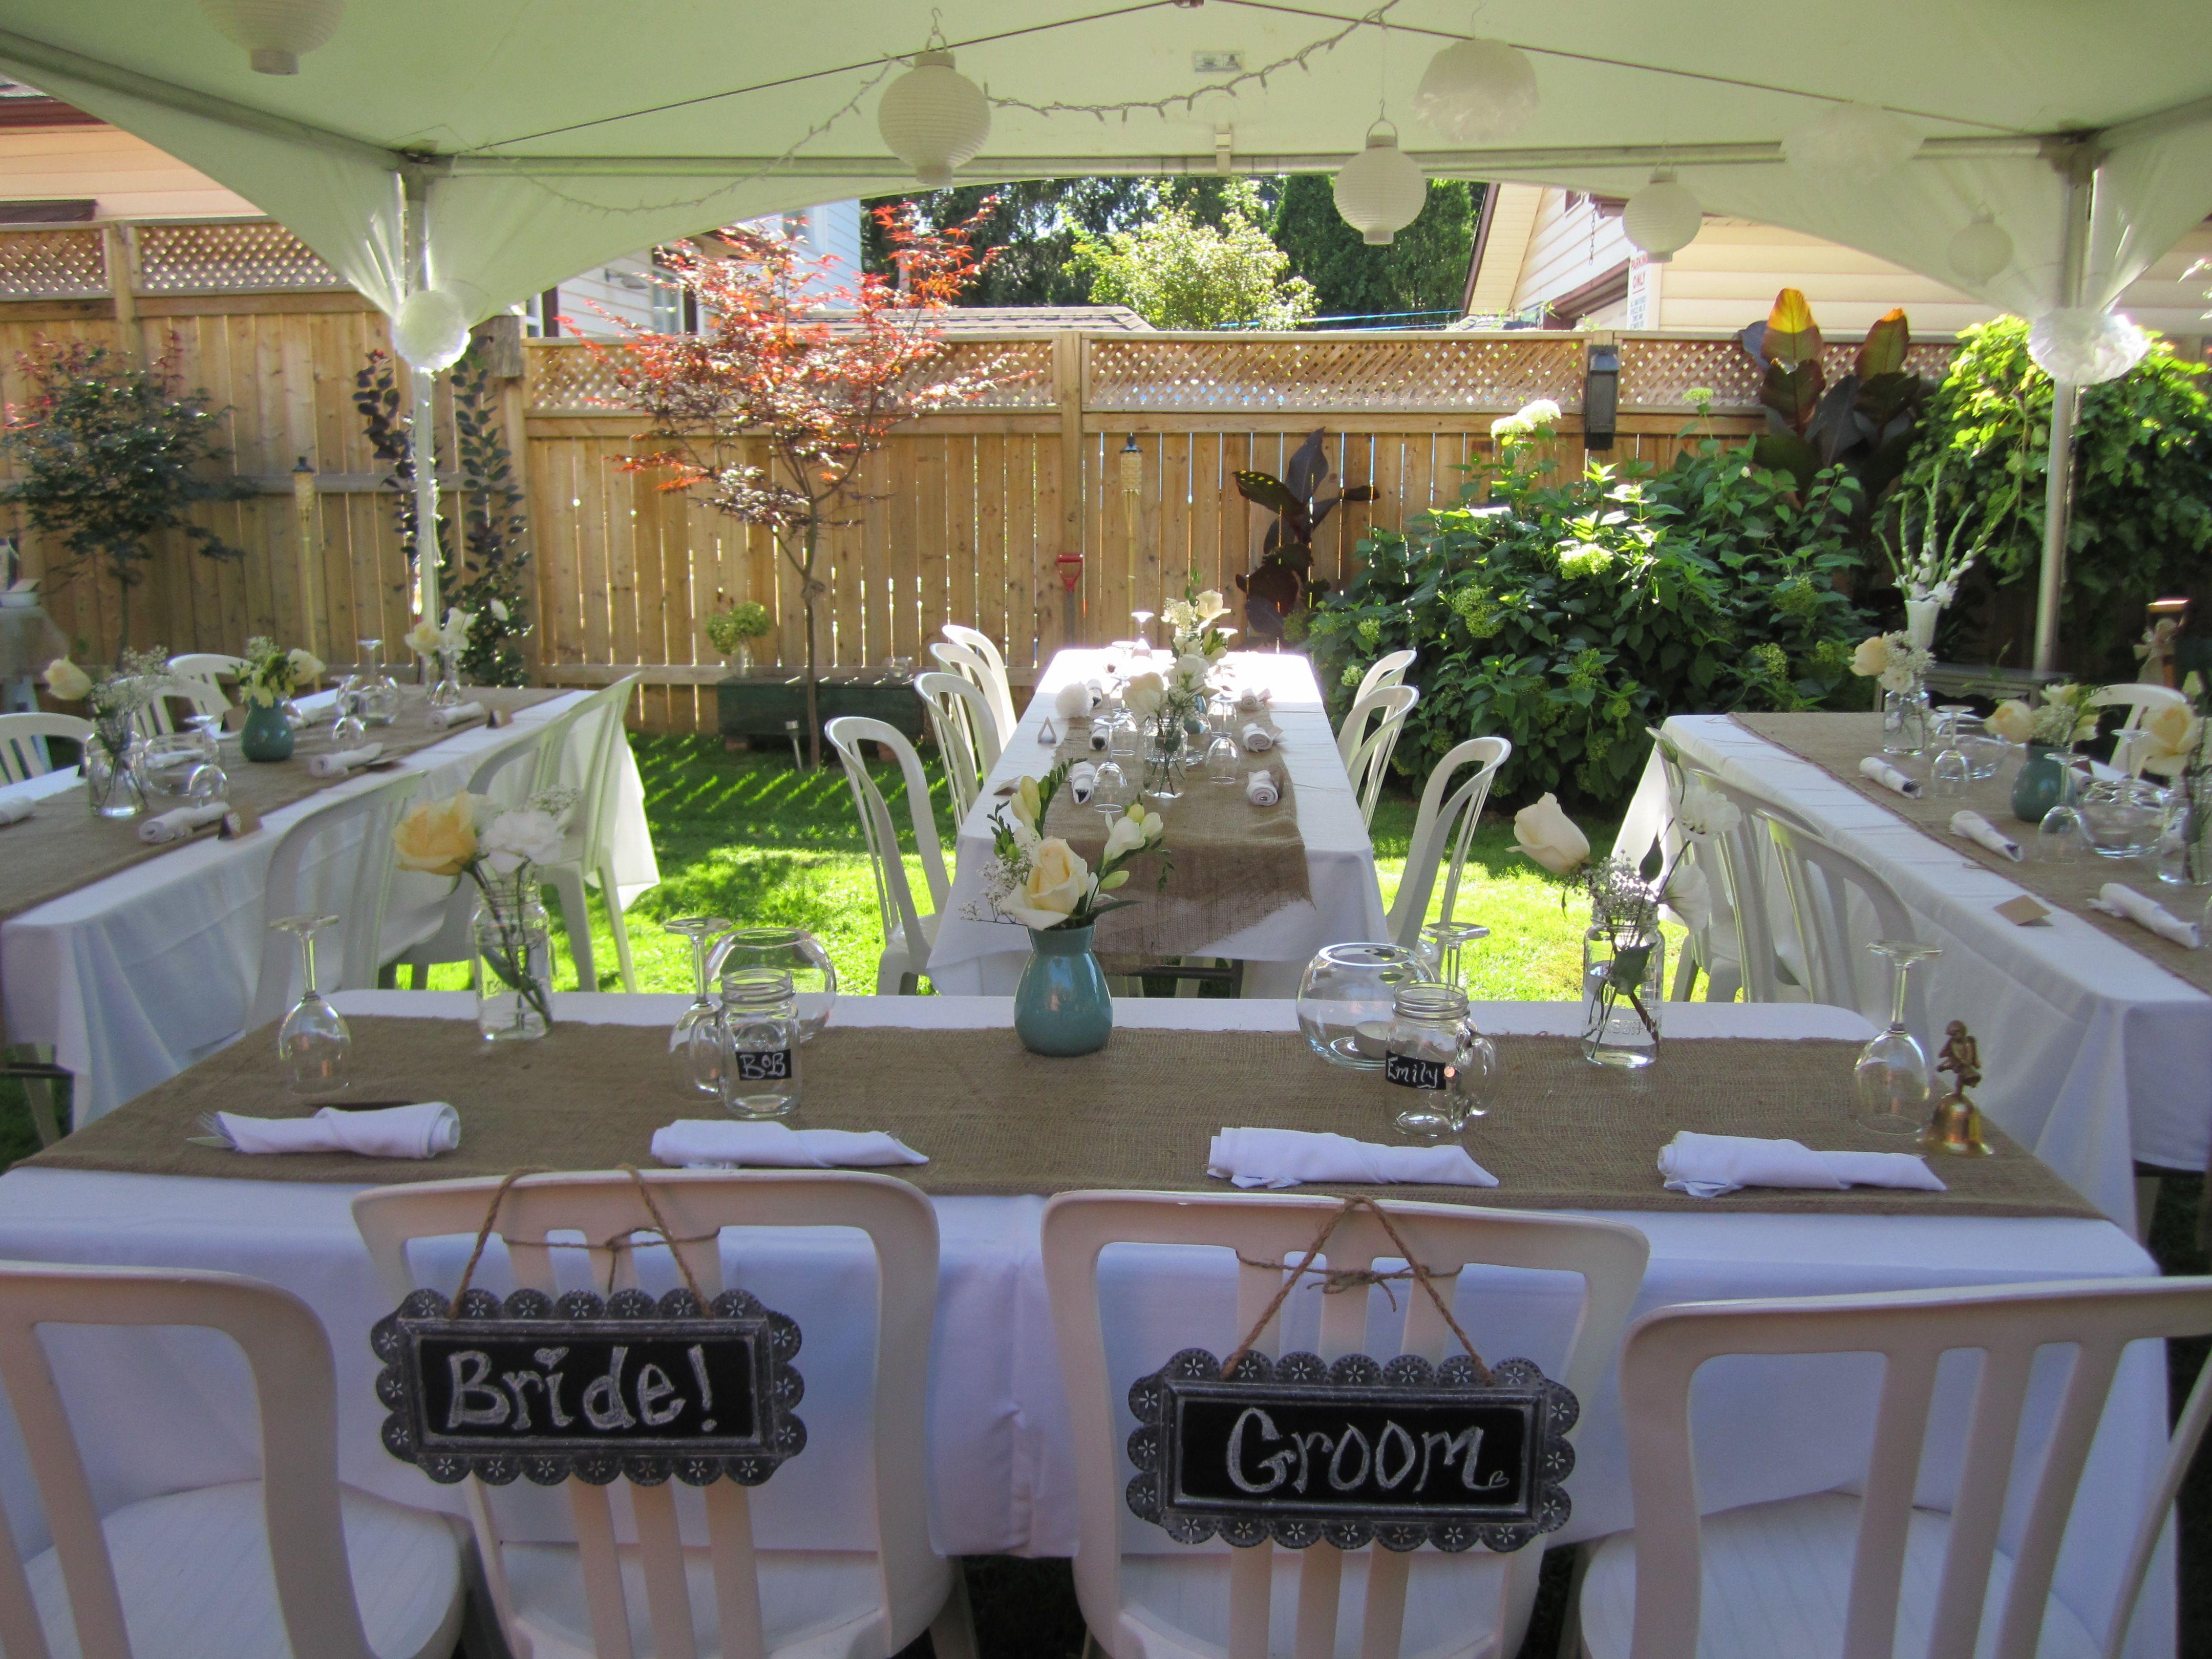 Small Backyard Wedding Doylestown Pa Wedding Photography: Pinterest: Discover And Save Creative Ideas